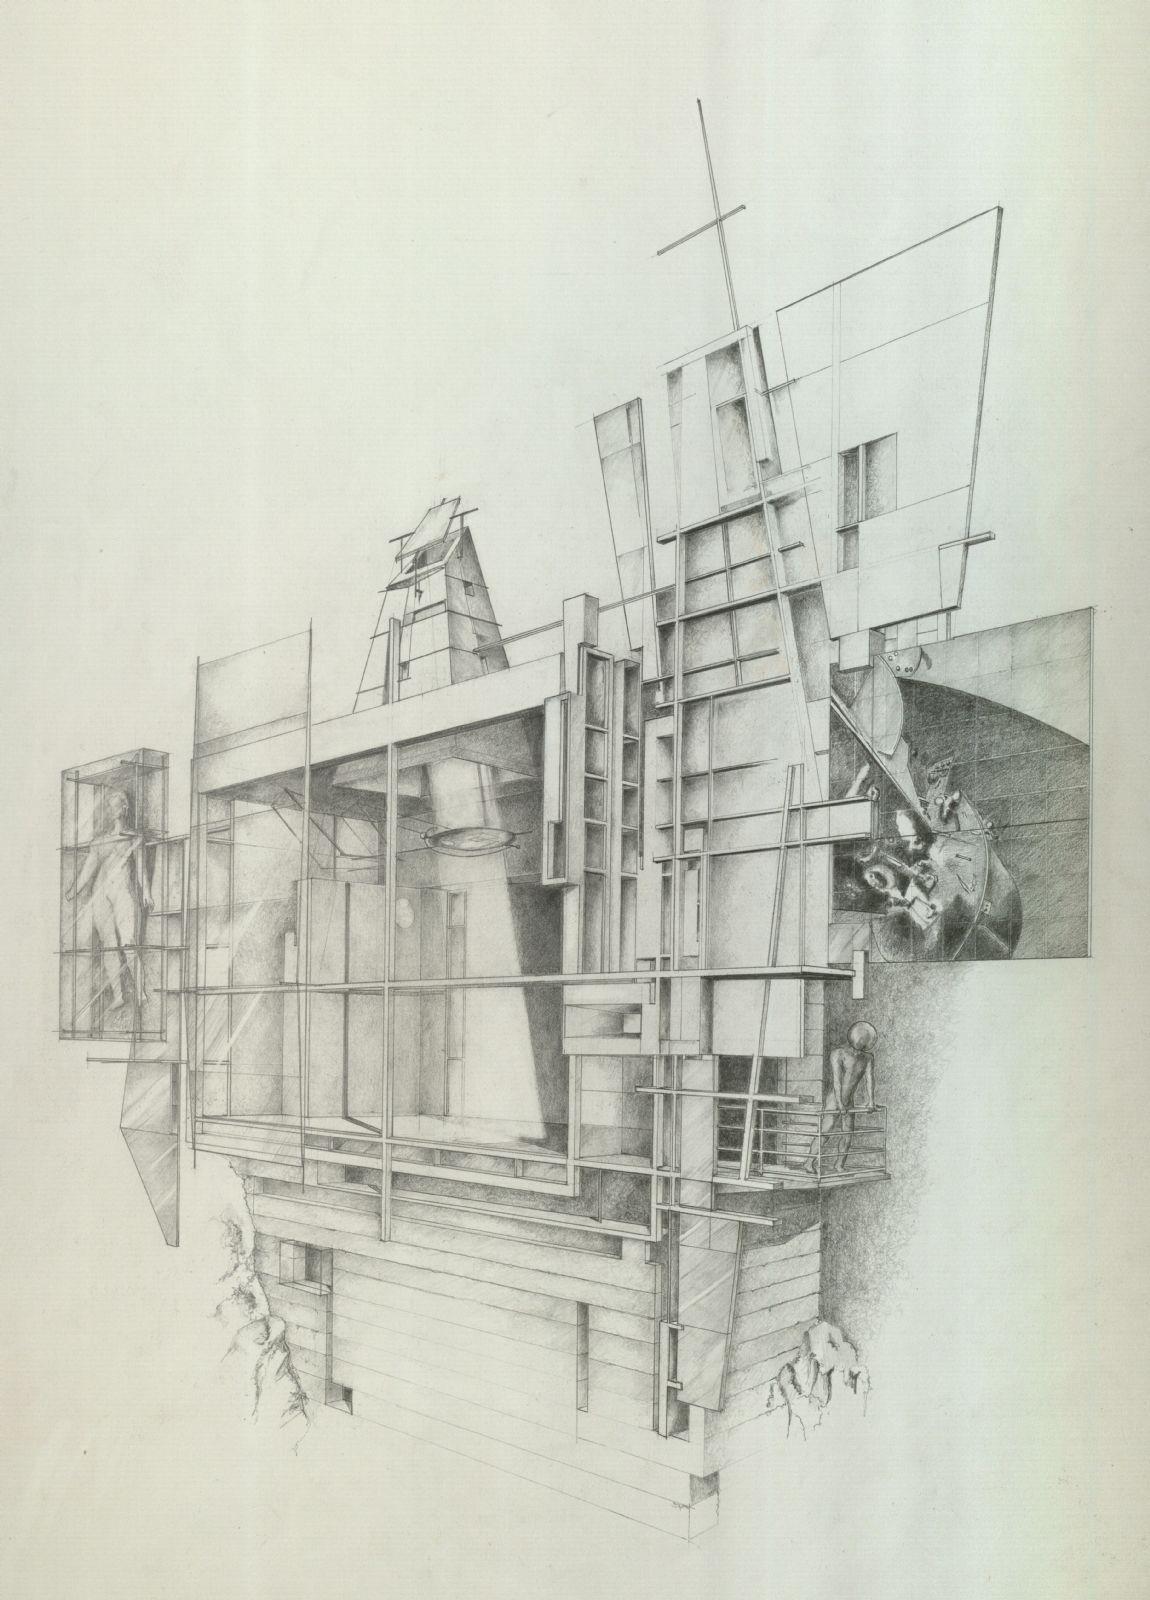 Krob architectural delineation architectural drawing for Cheap architectural drawings